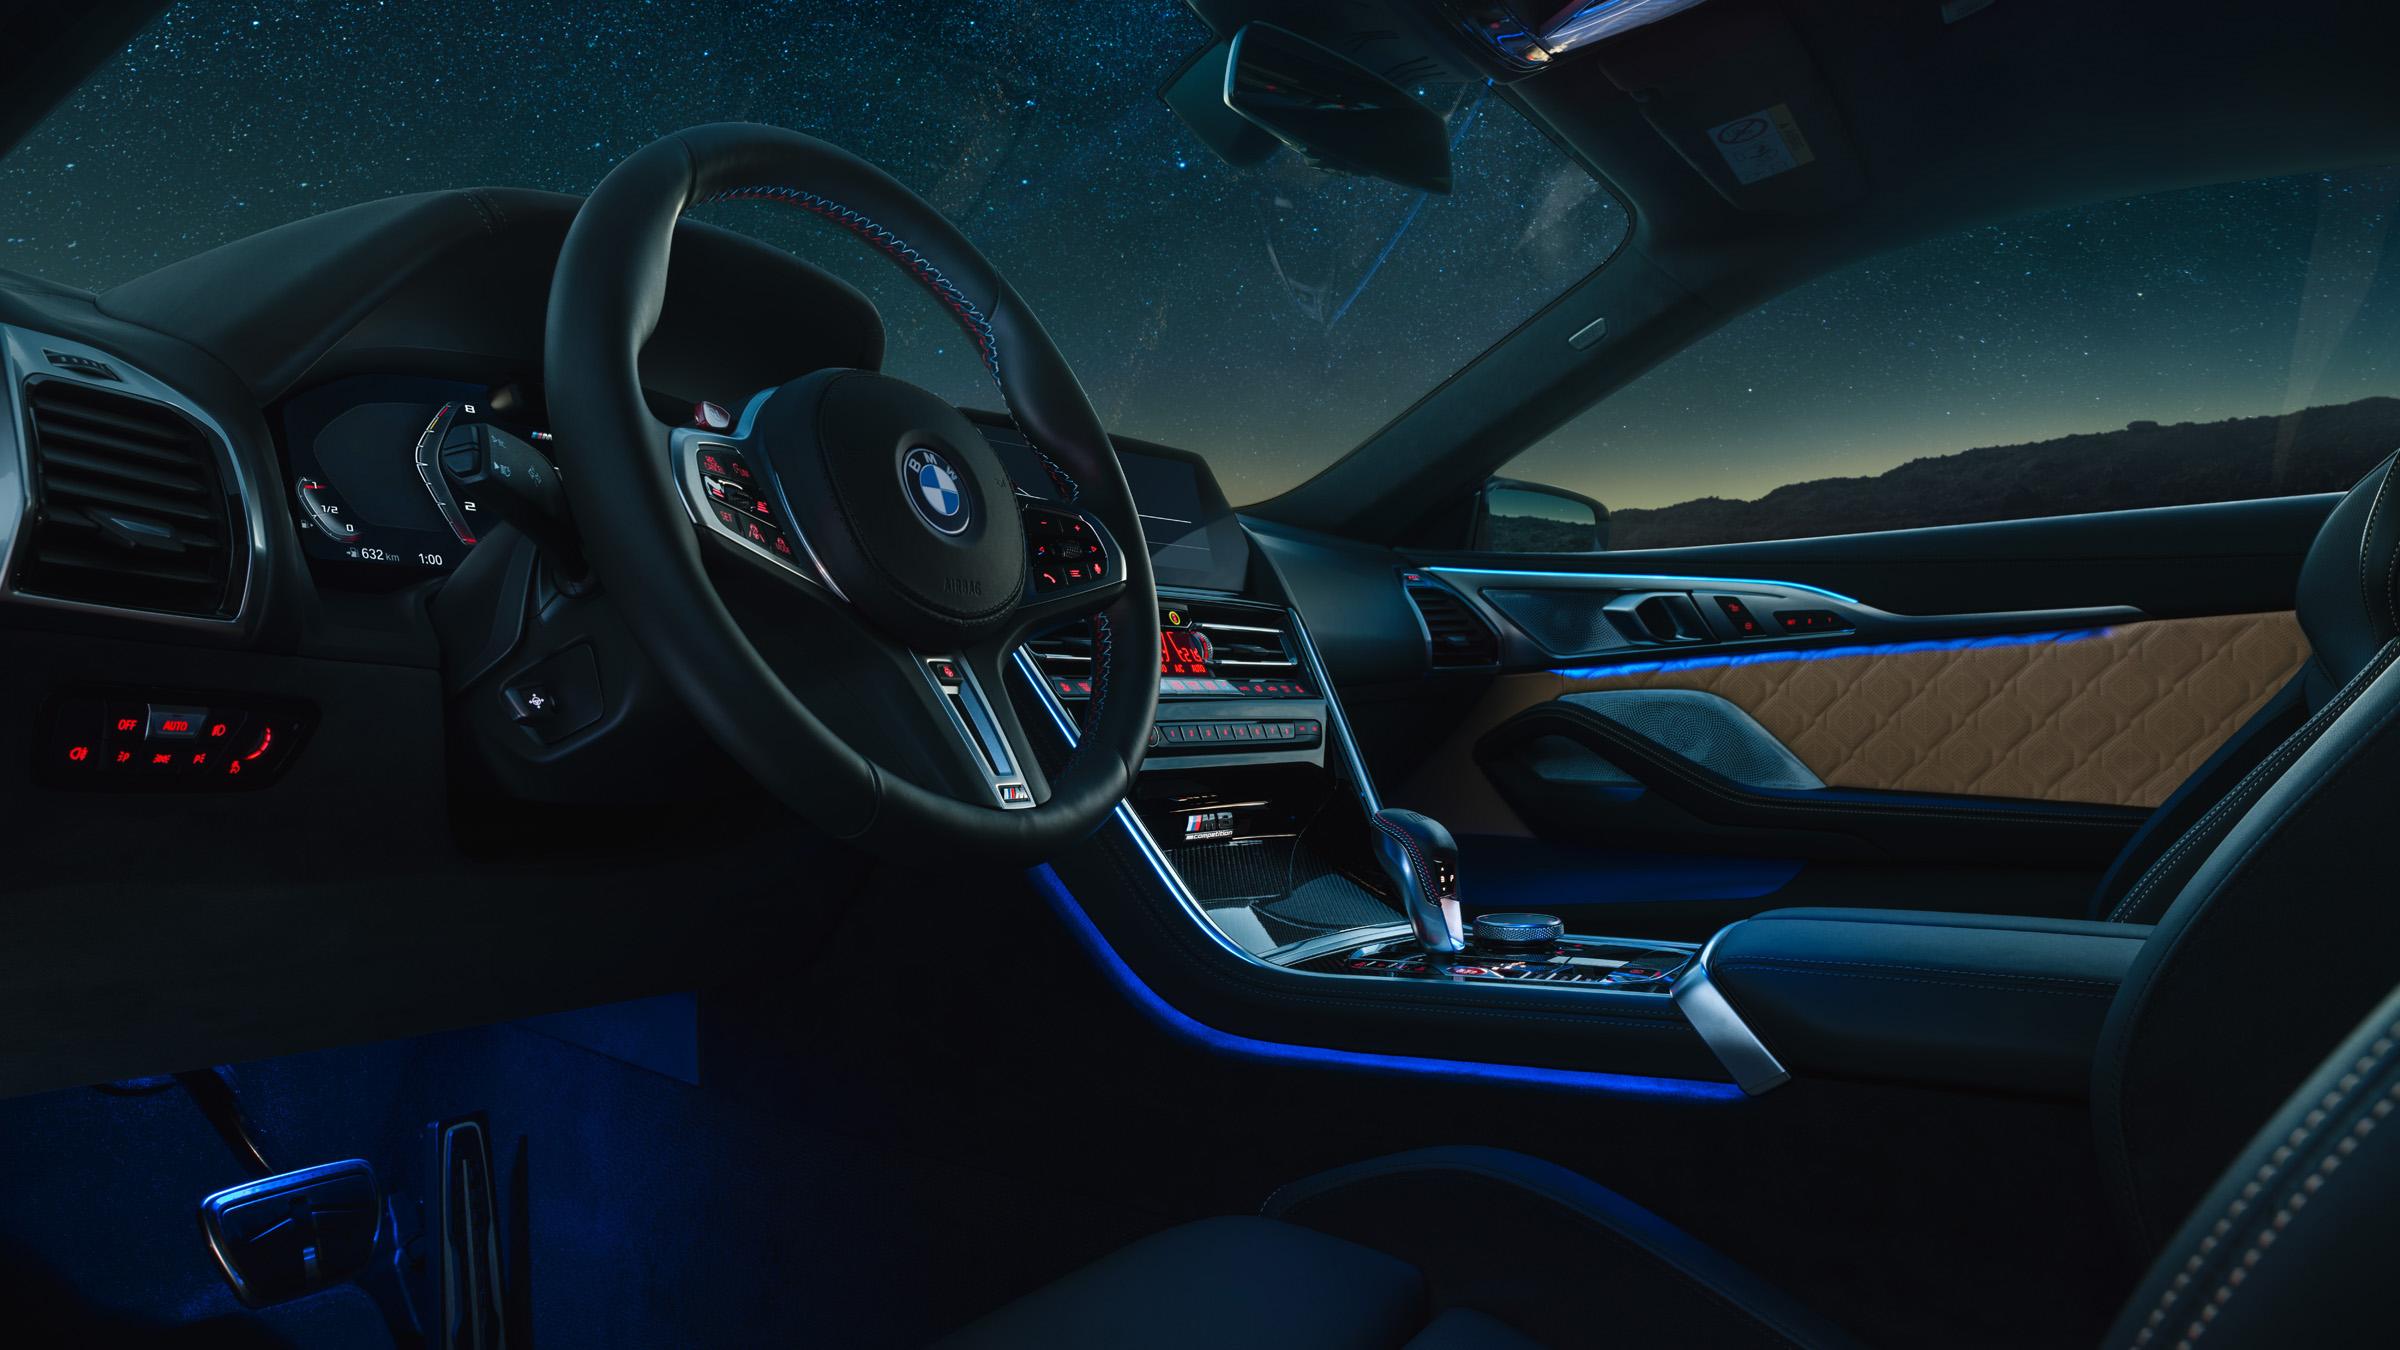 BMW_M8_COUPE_KONRAD_SCHMIDT_10_2400x1350